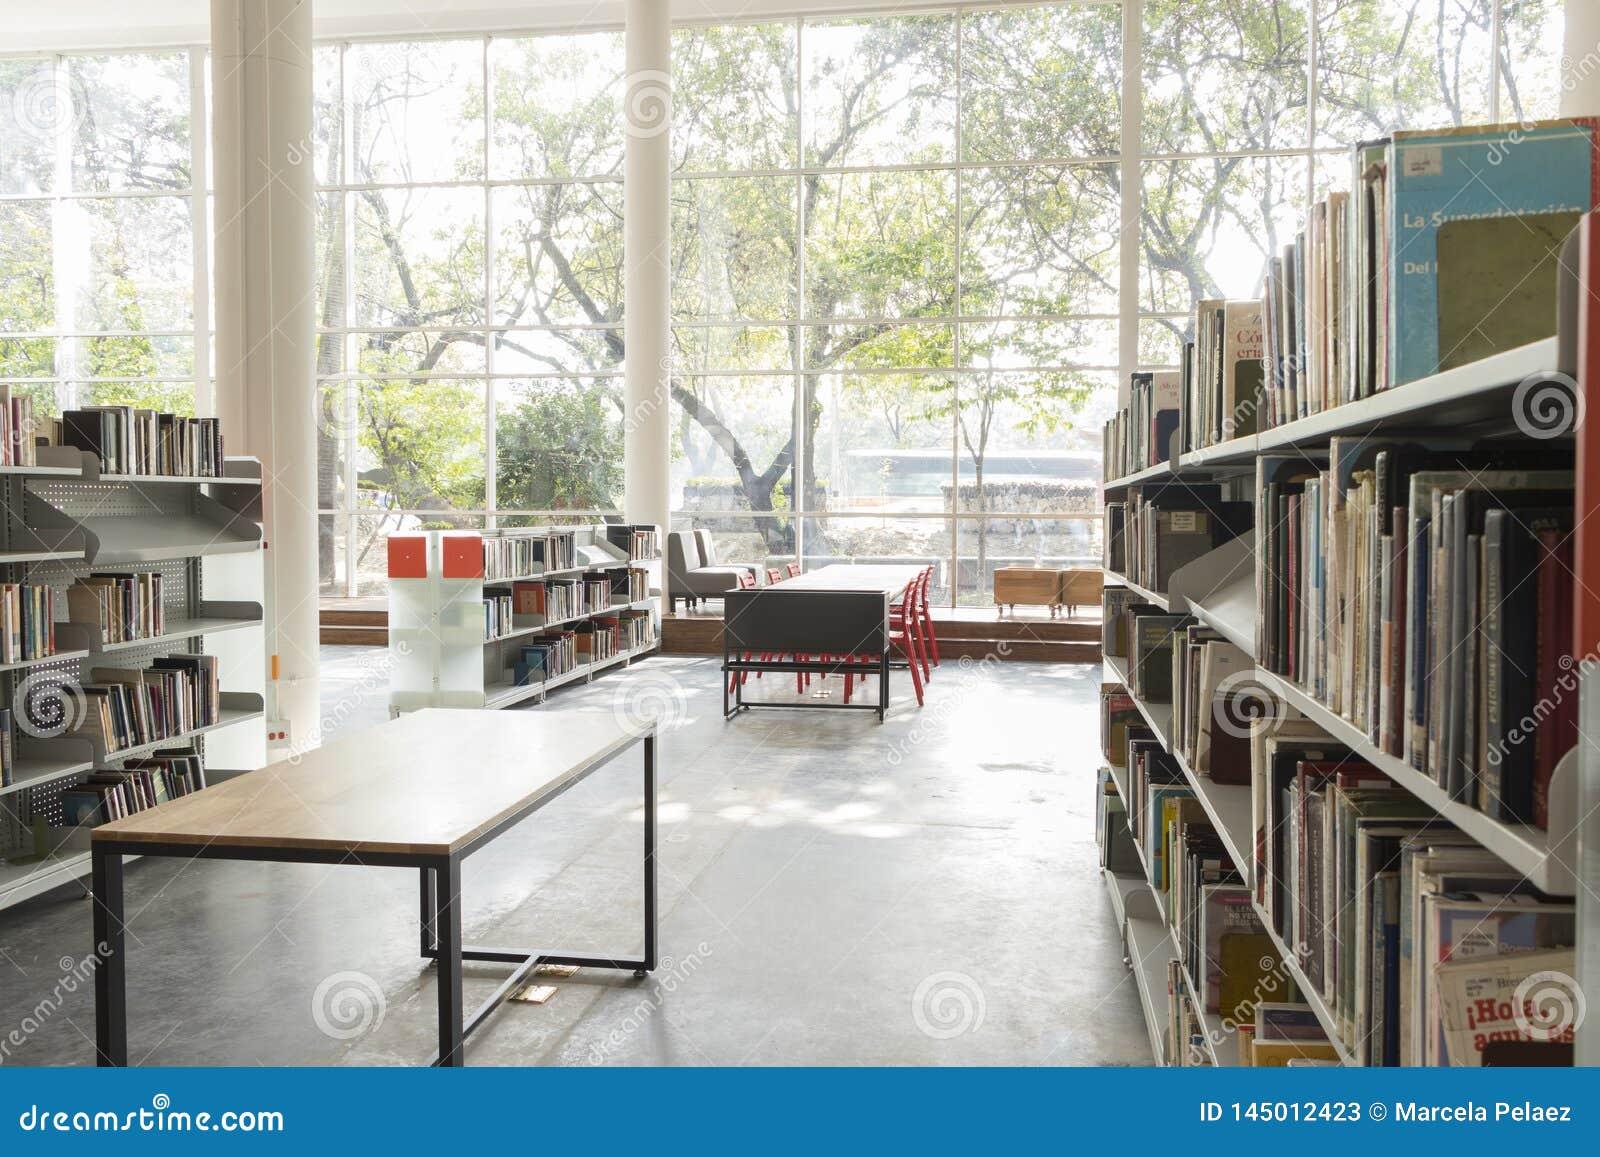 Biblioteca pública medellin biblioteca pública piloto primeira jornada dezembro de 2018